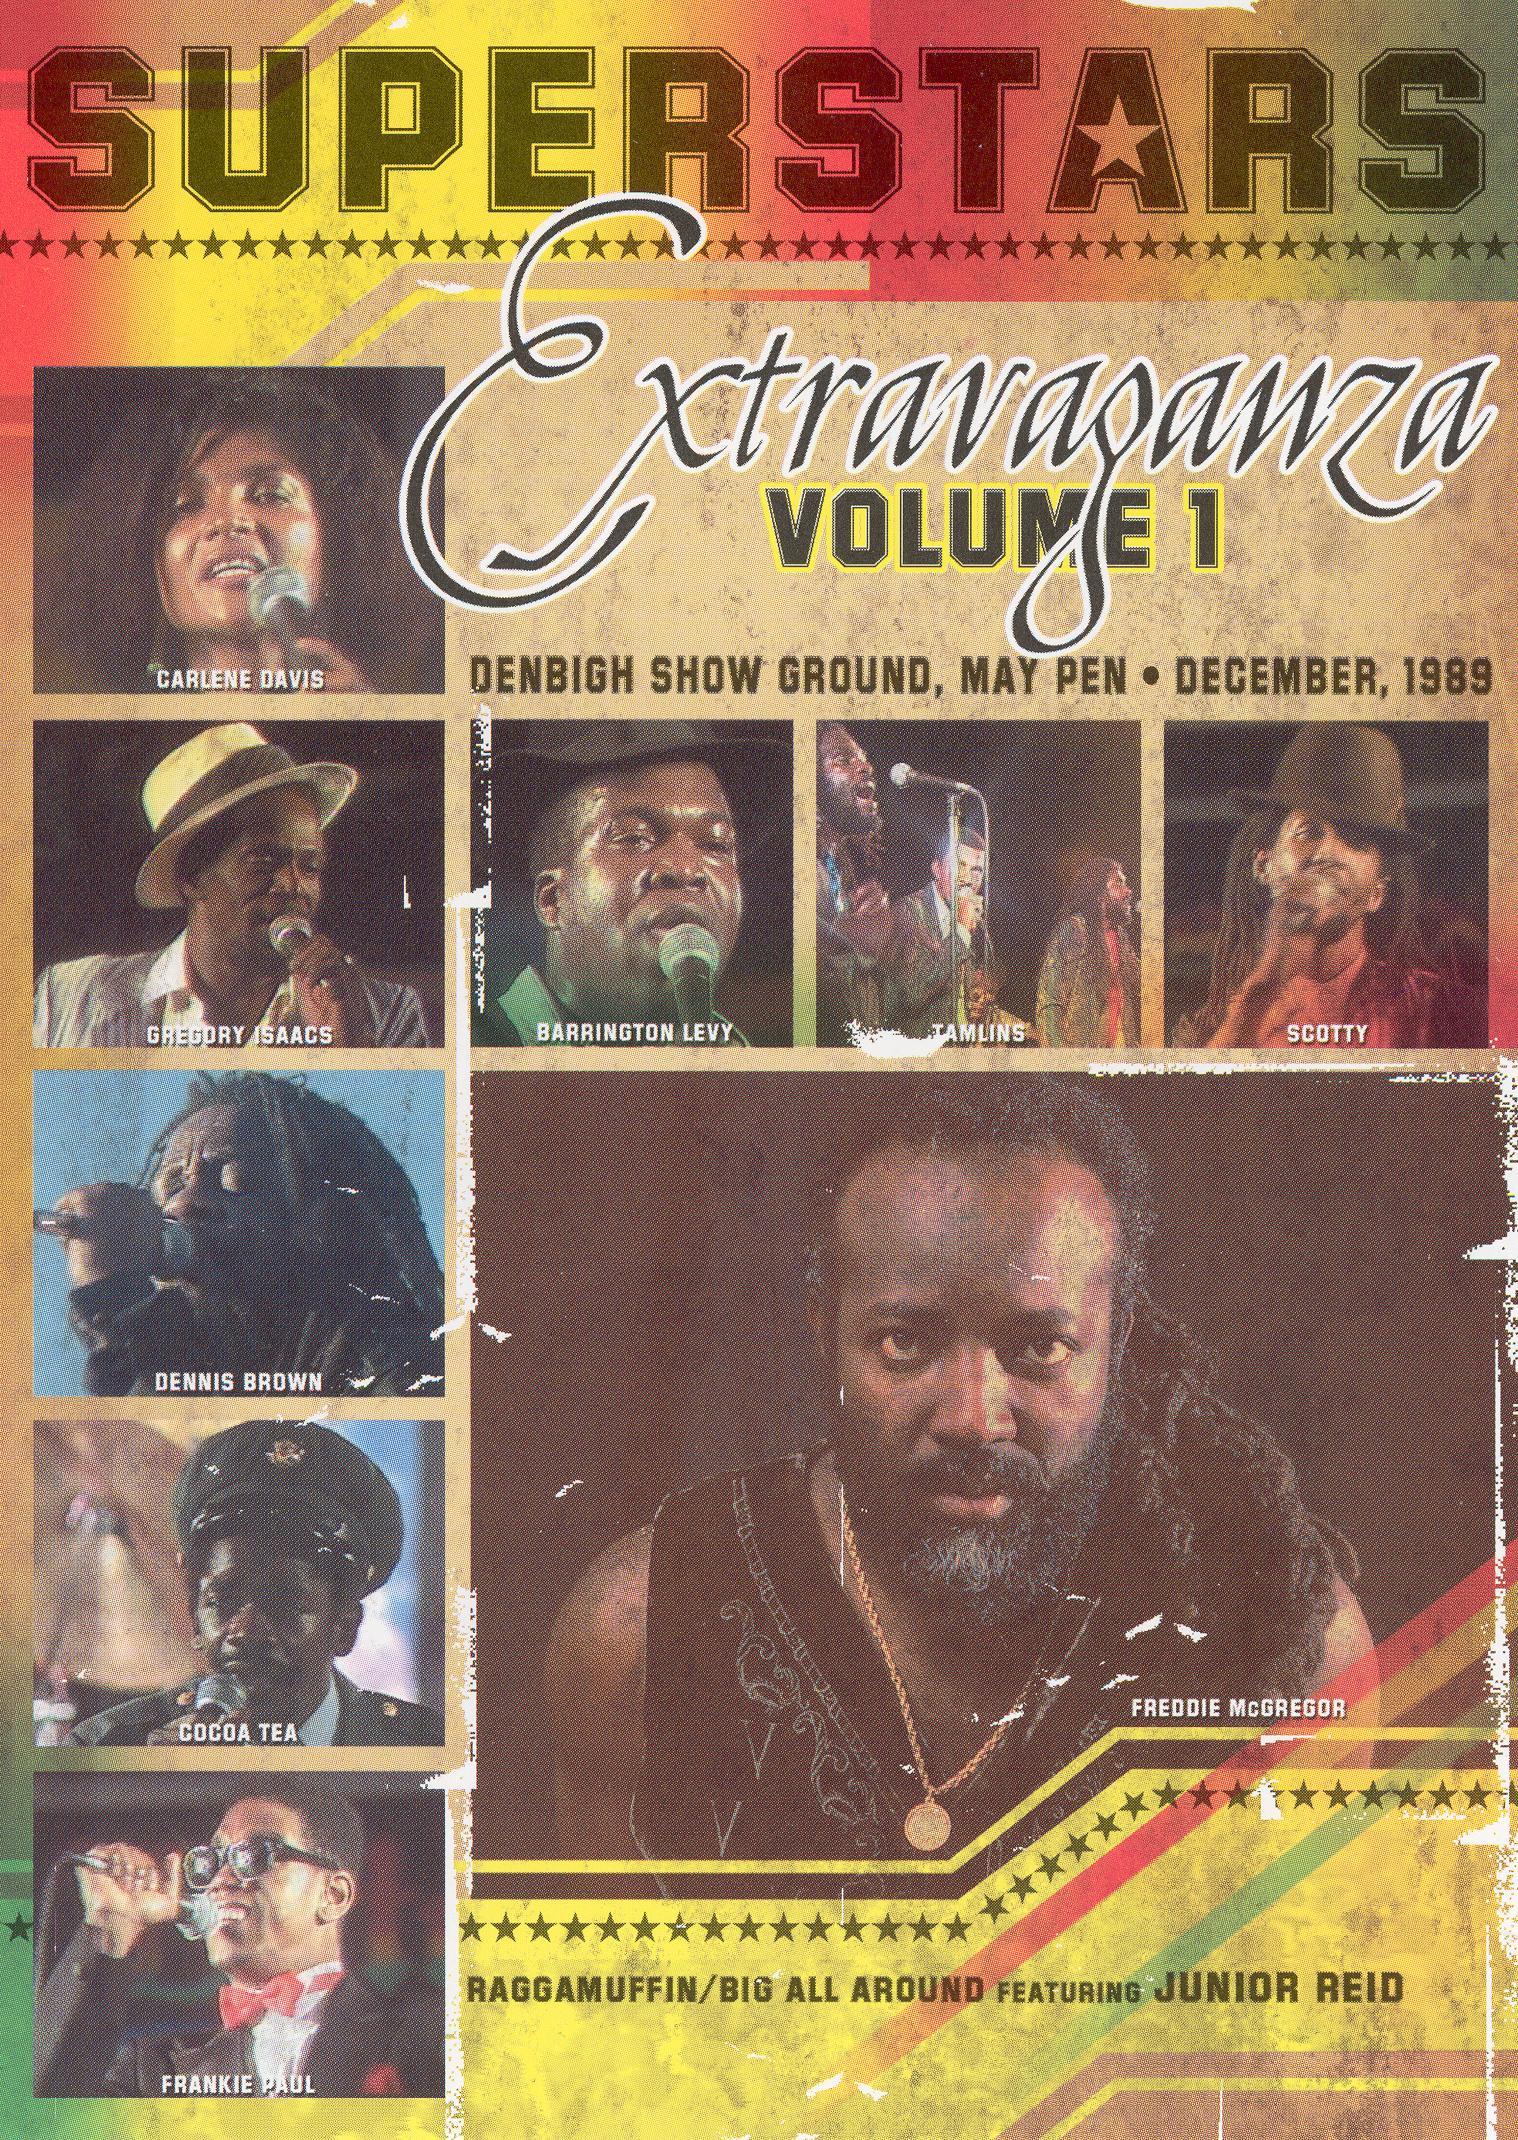 Superstars Extravaganza, Vol. 1